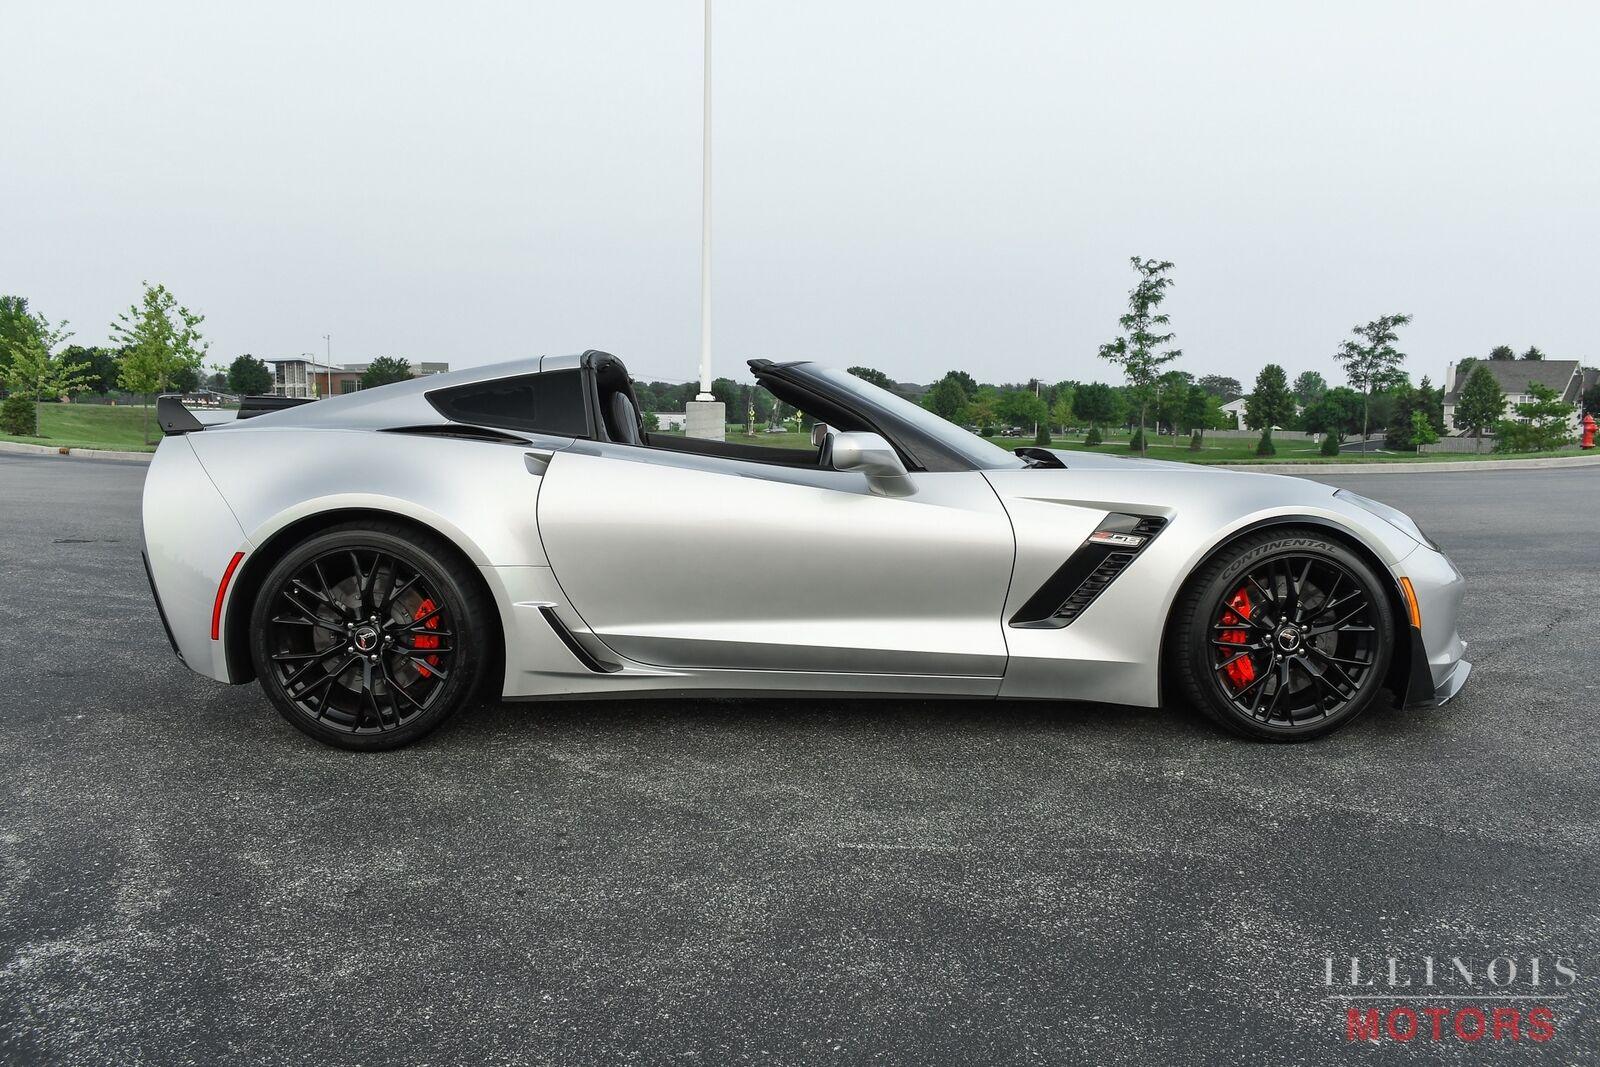 2015 Silver Chevrolet Corvette Z06  | C7 Corvette Photo 7